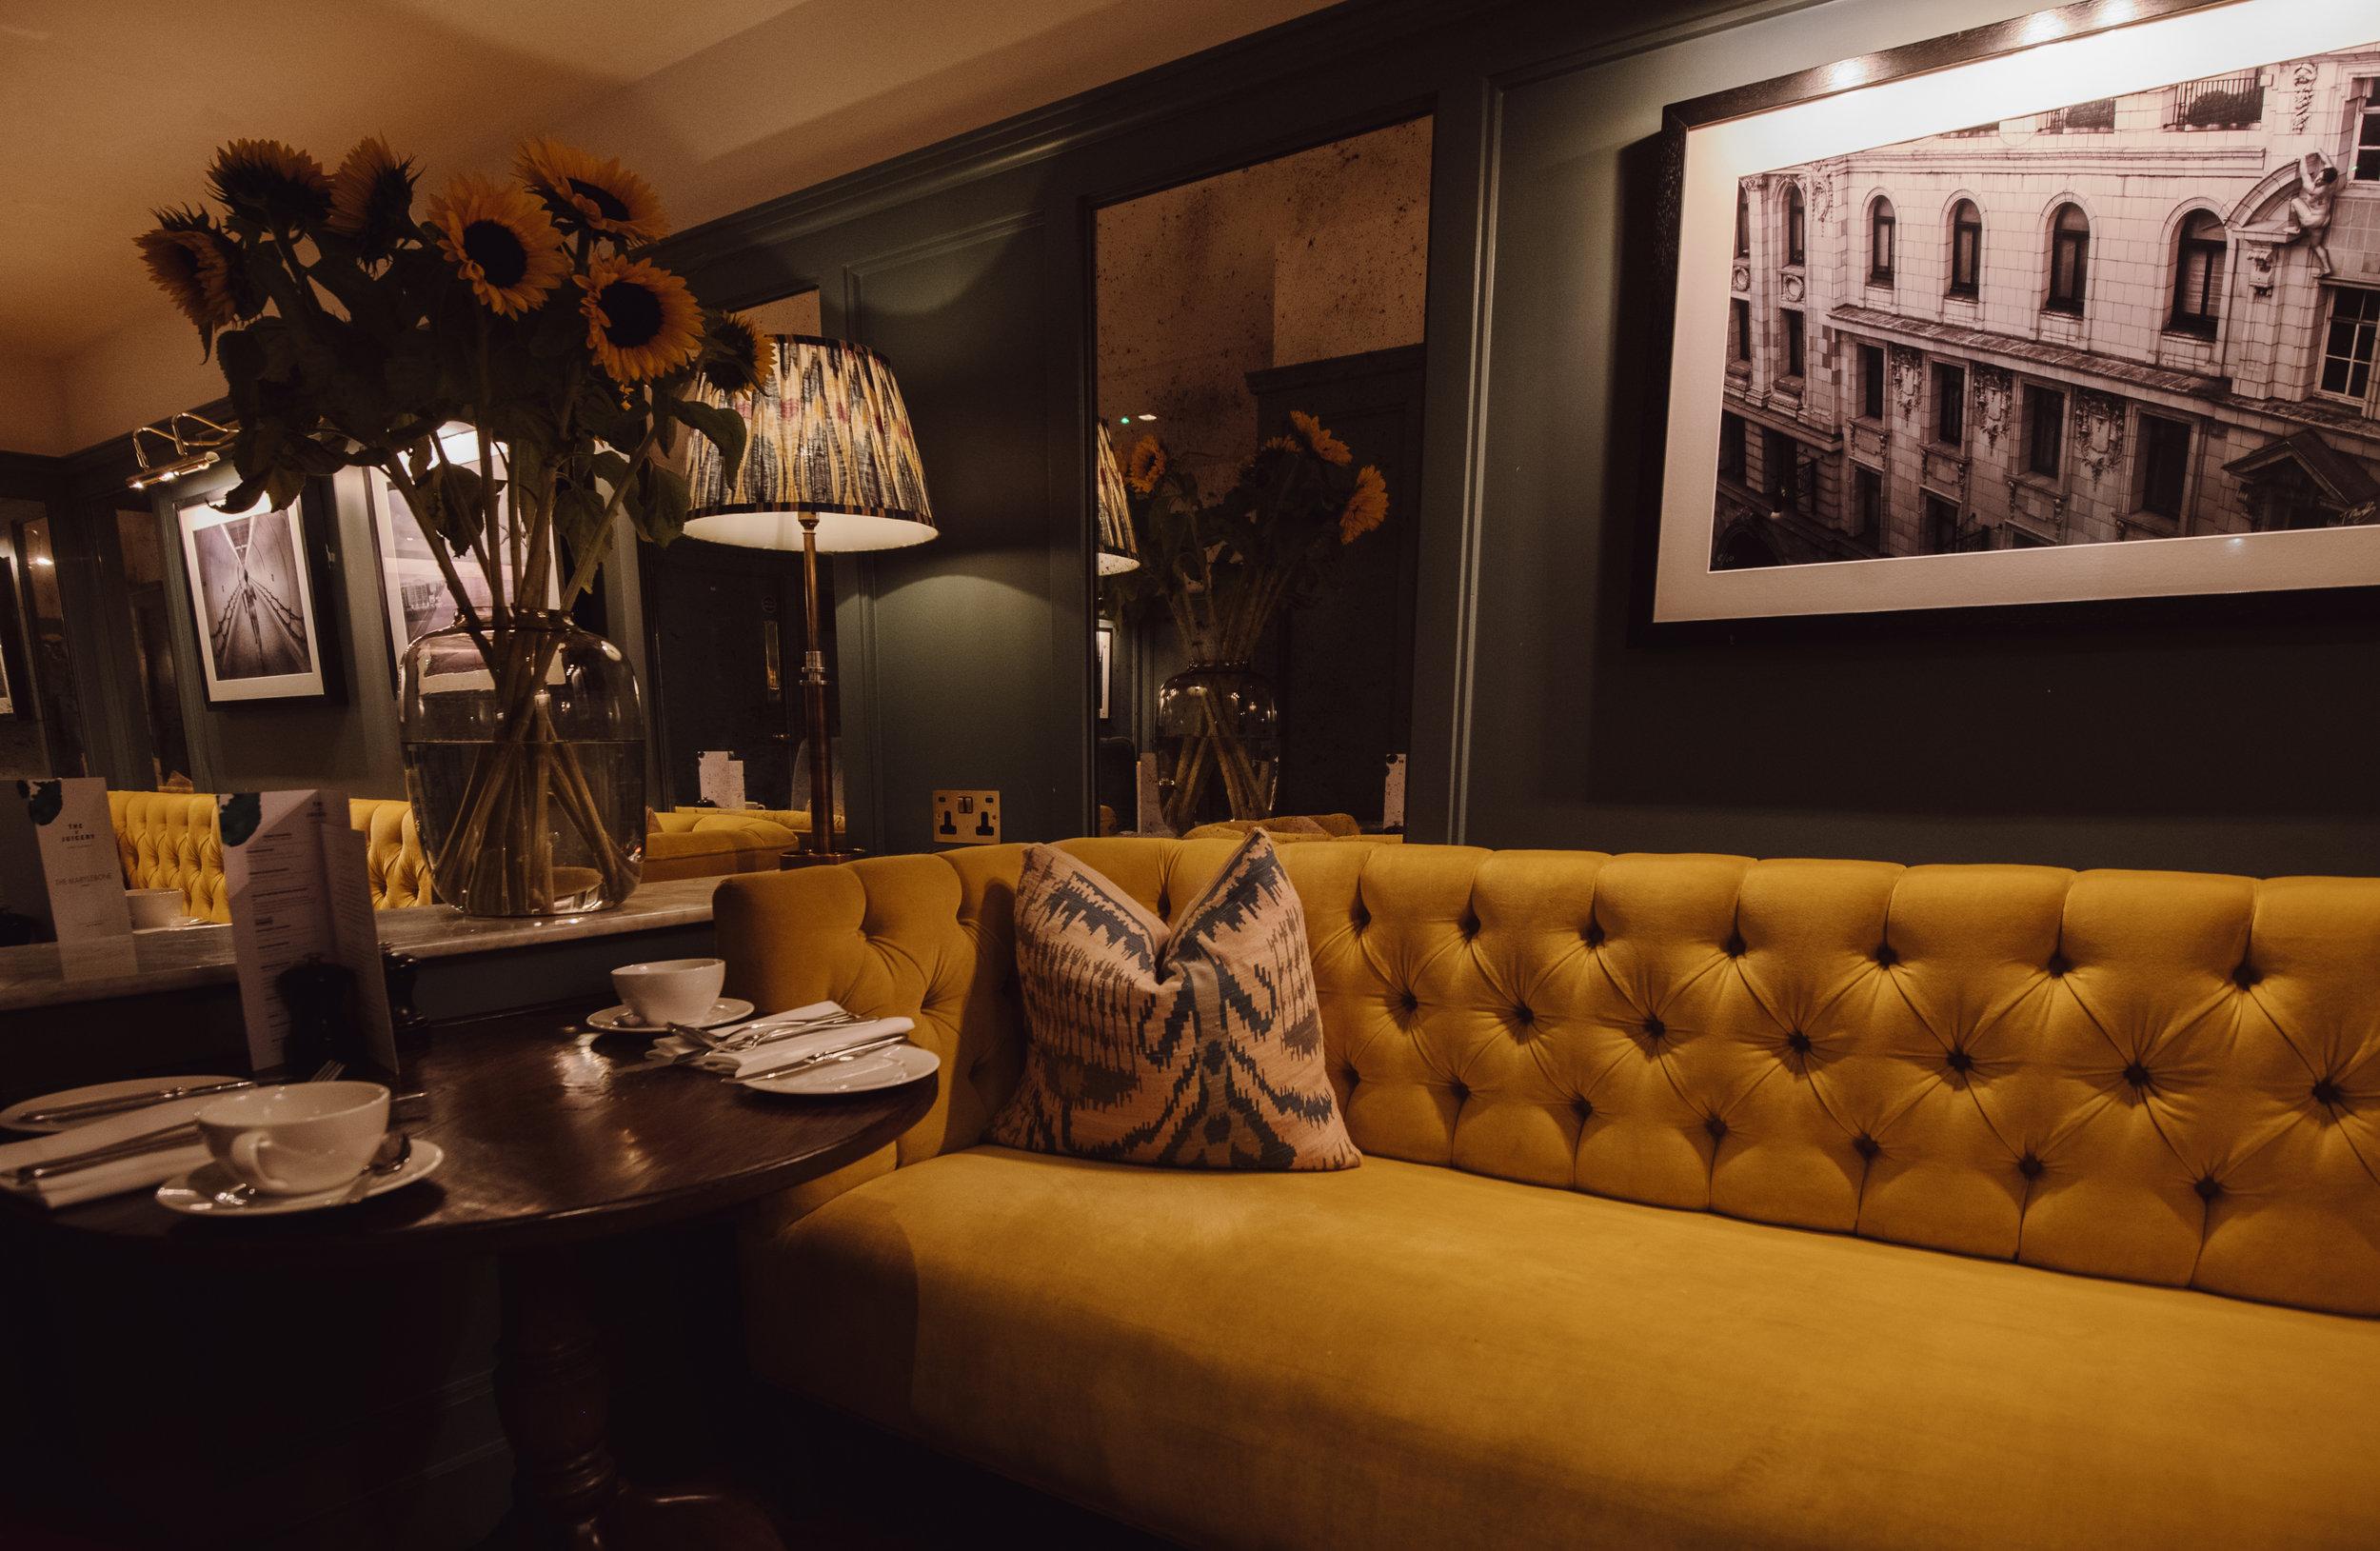 Hotel Marylebone | Nicole Bissey Photography 10.JPG